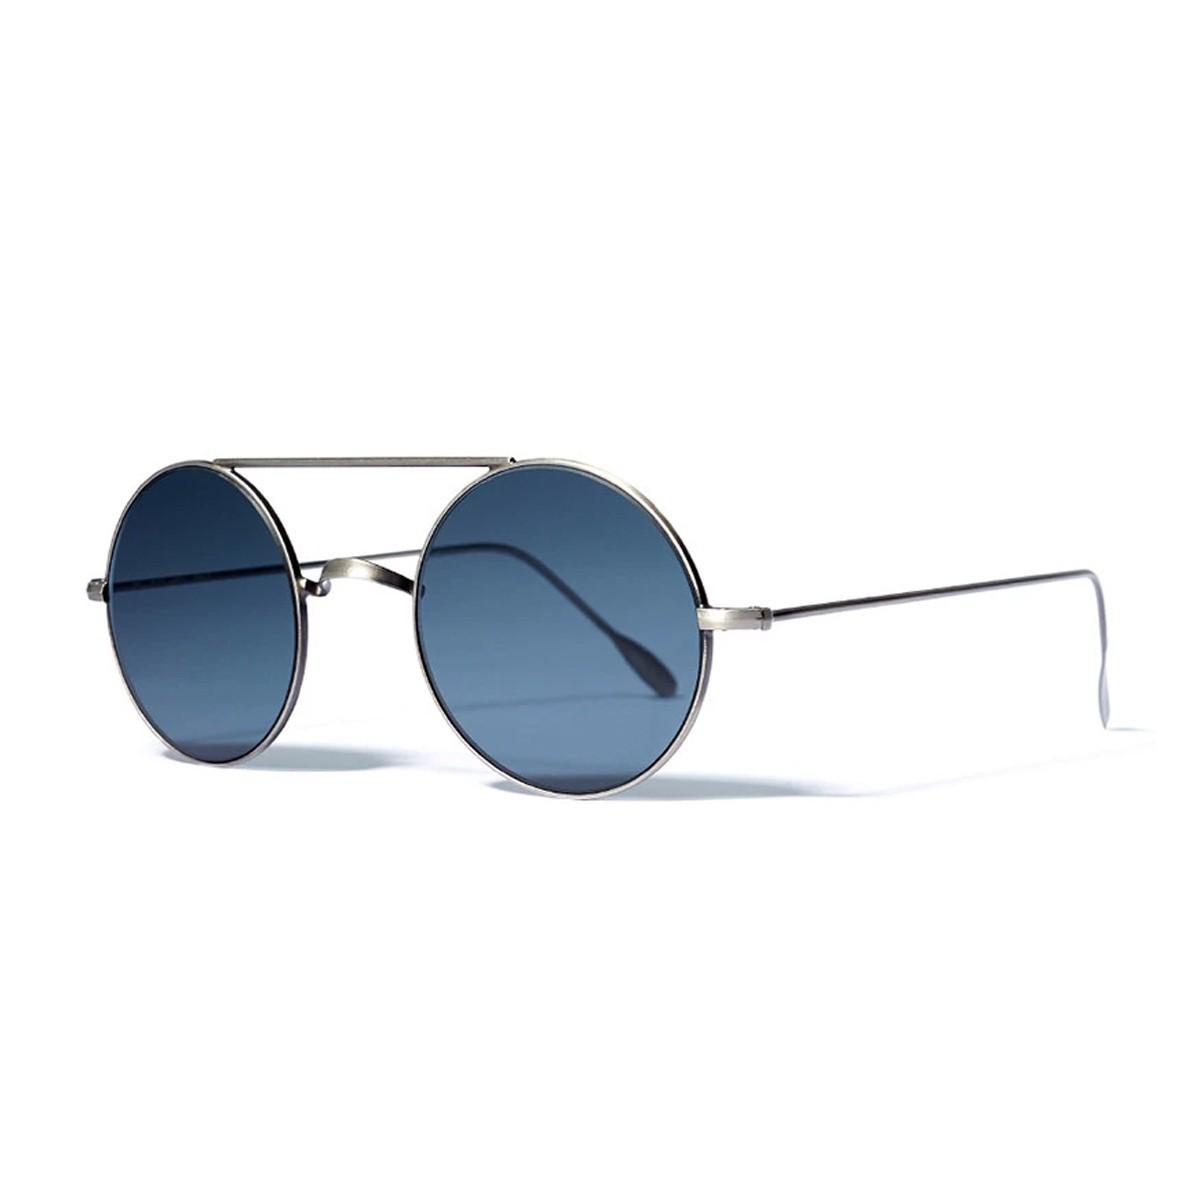 Bob Sdrunk Django/S | Unisex sunglasses